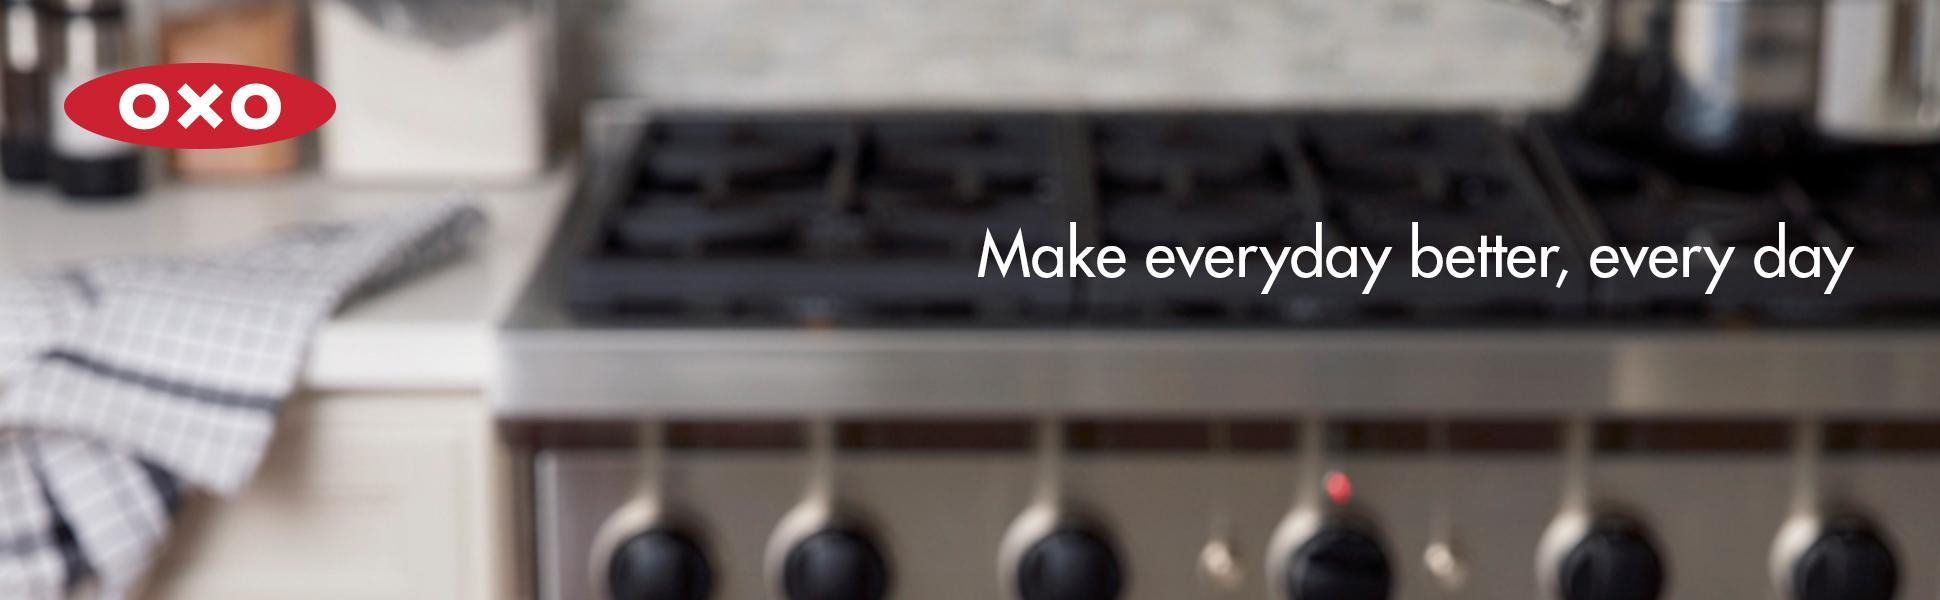 Amazon.com: OXO Good Grips Chopper: Kitchen & Dining